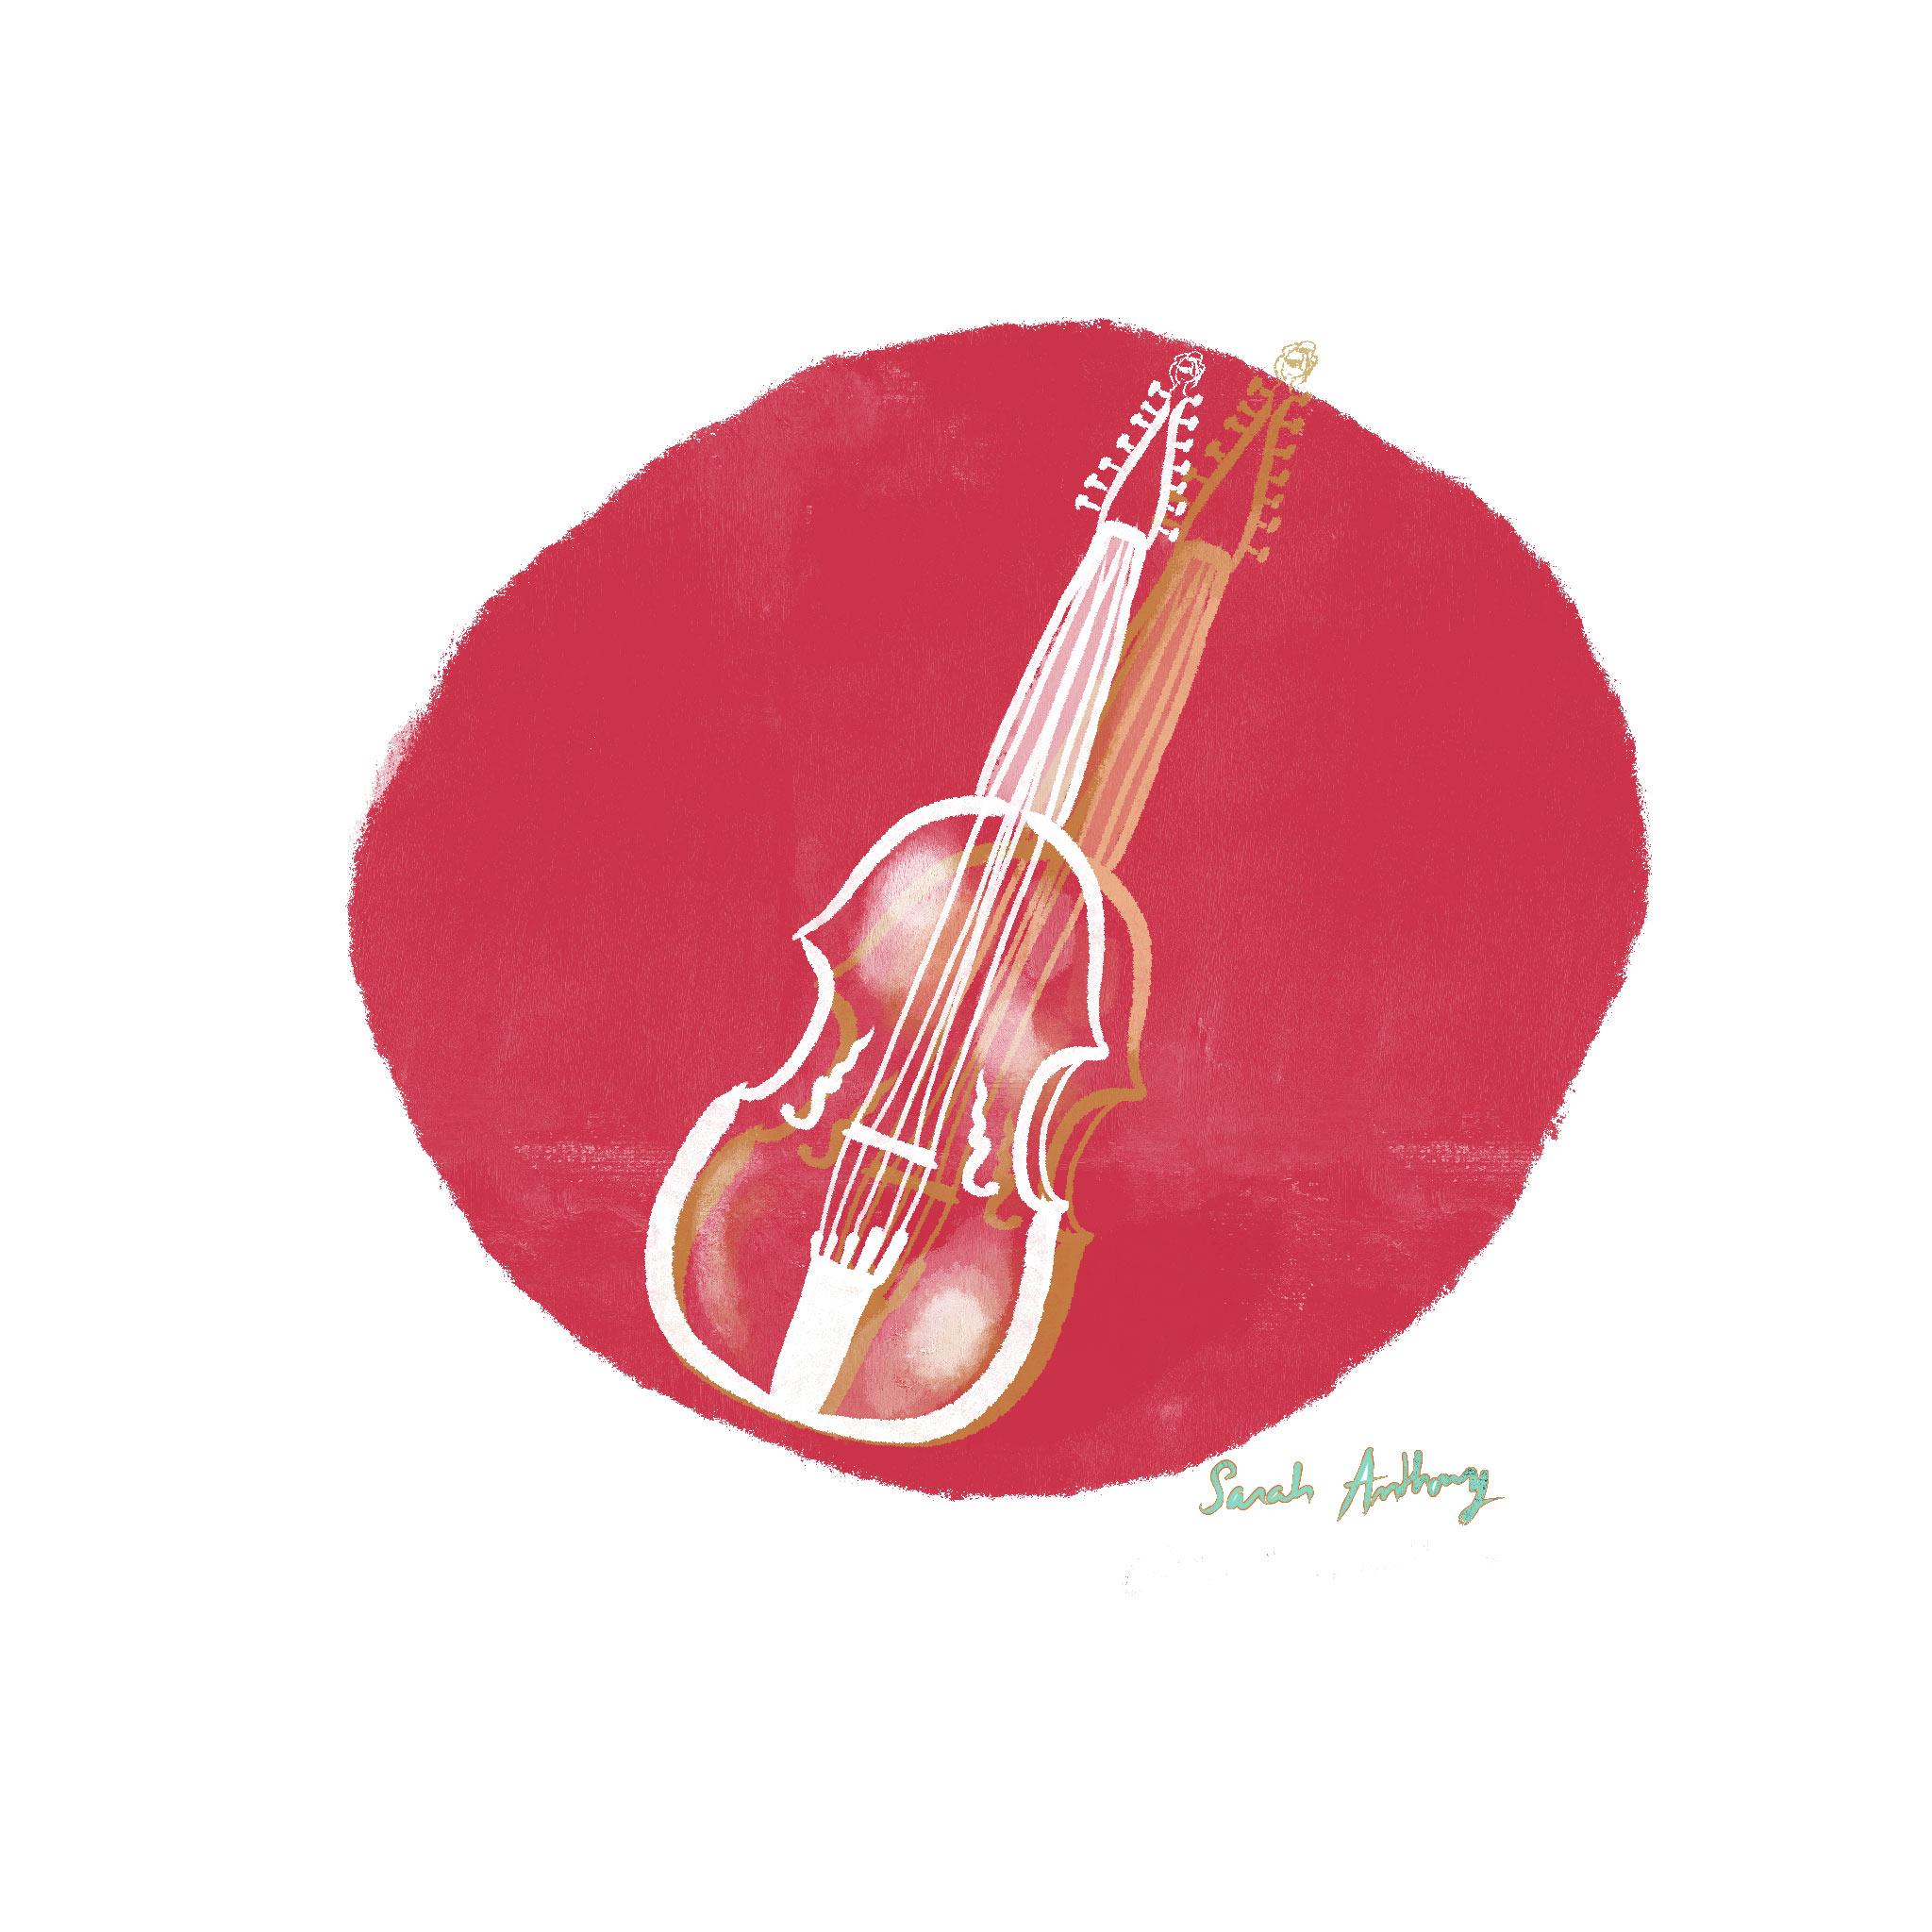 viole-damour-sarah-anthony-reduit